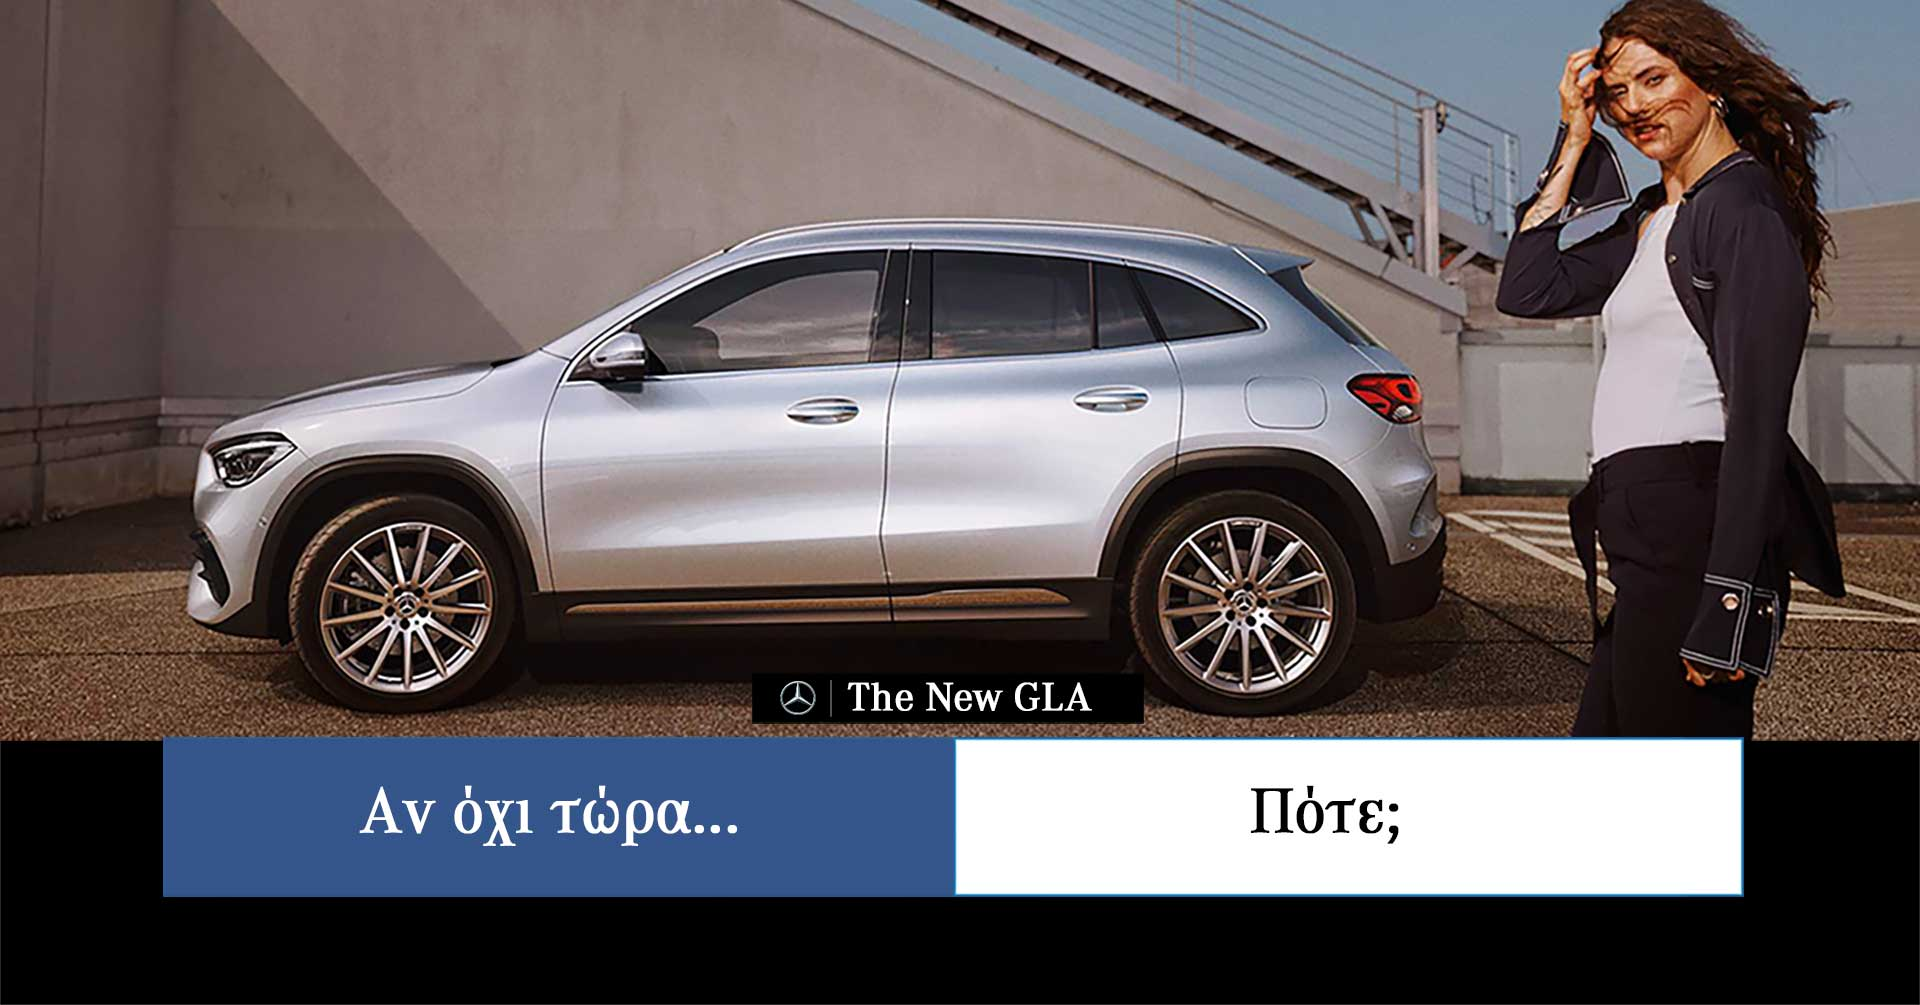 New GLA